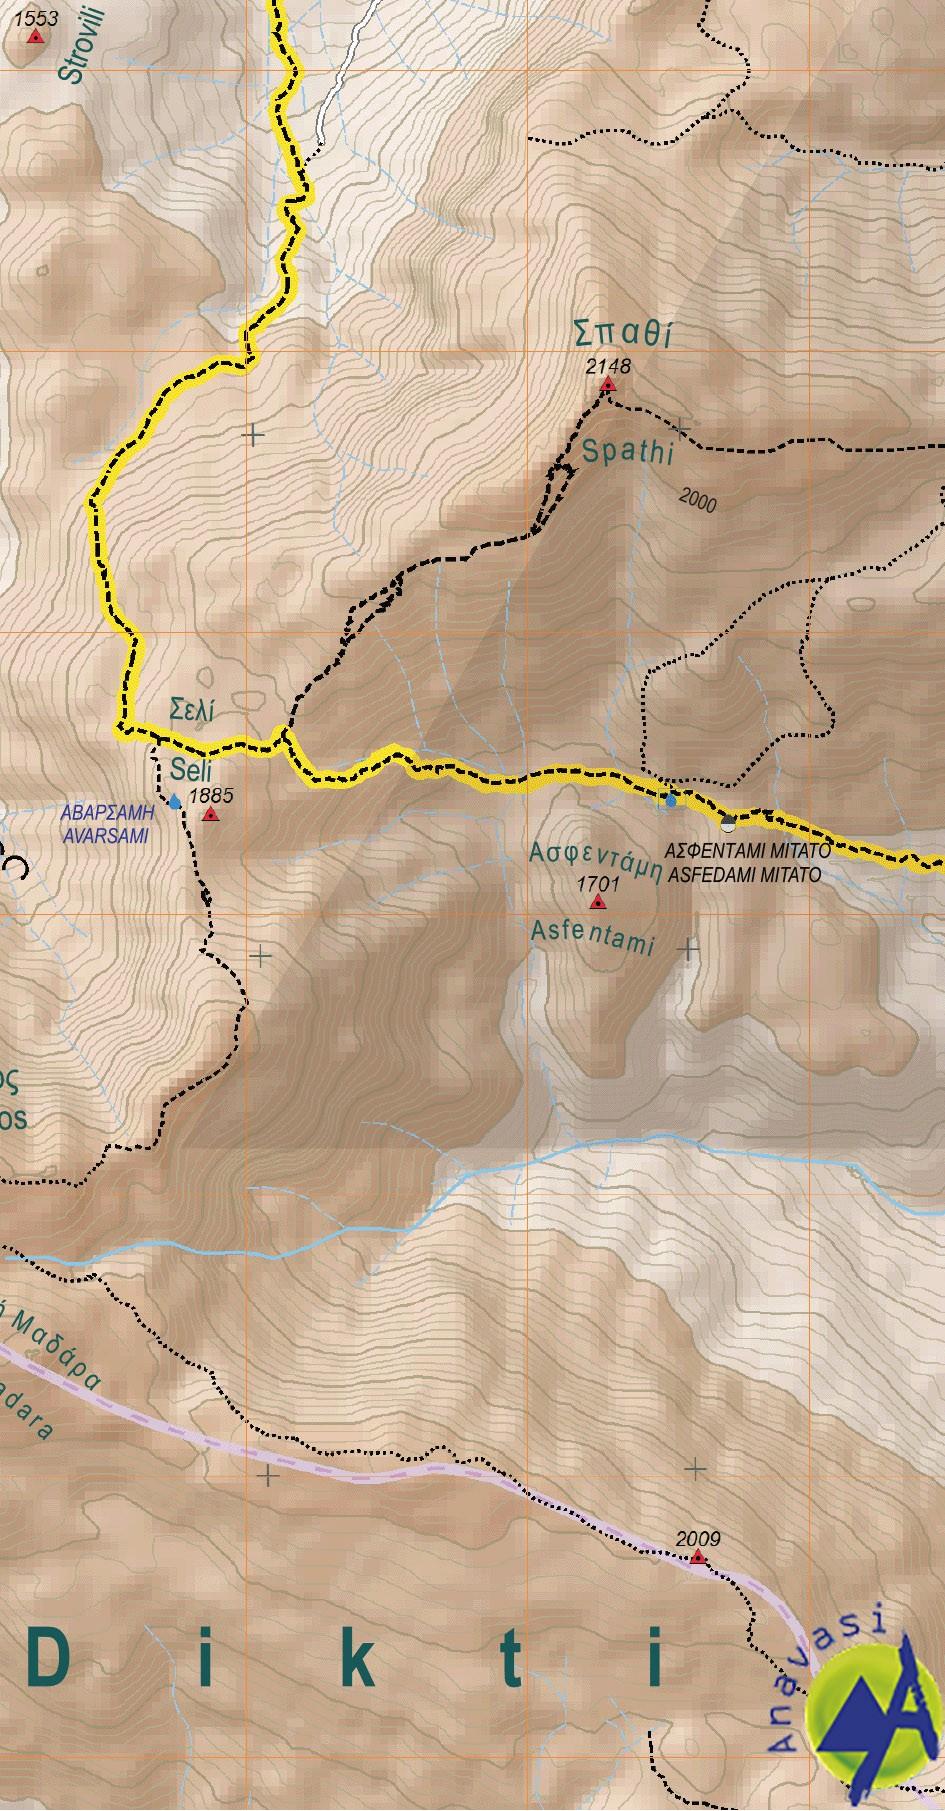 Dikti - Selena • Hiking map 1:35000